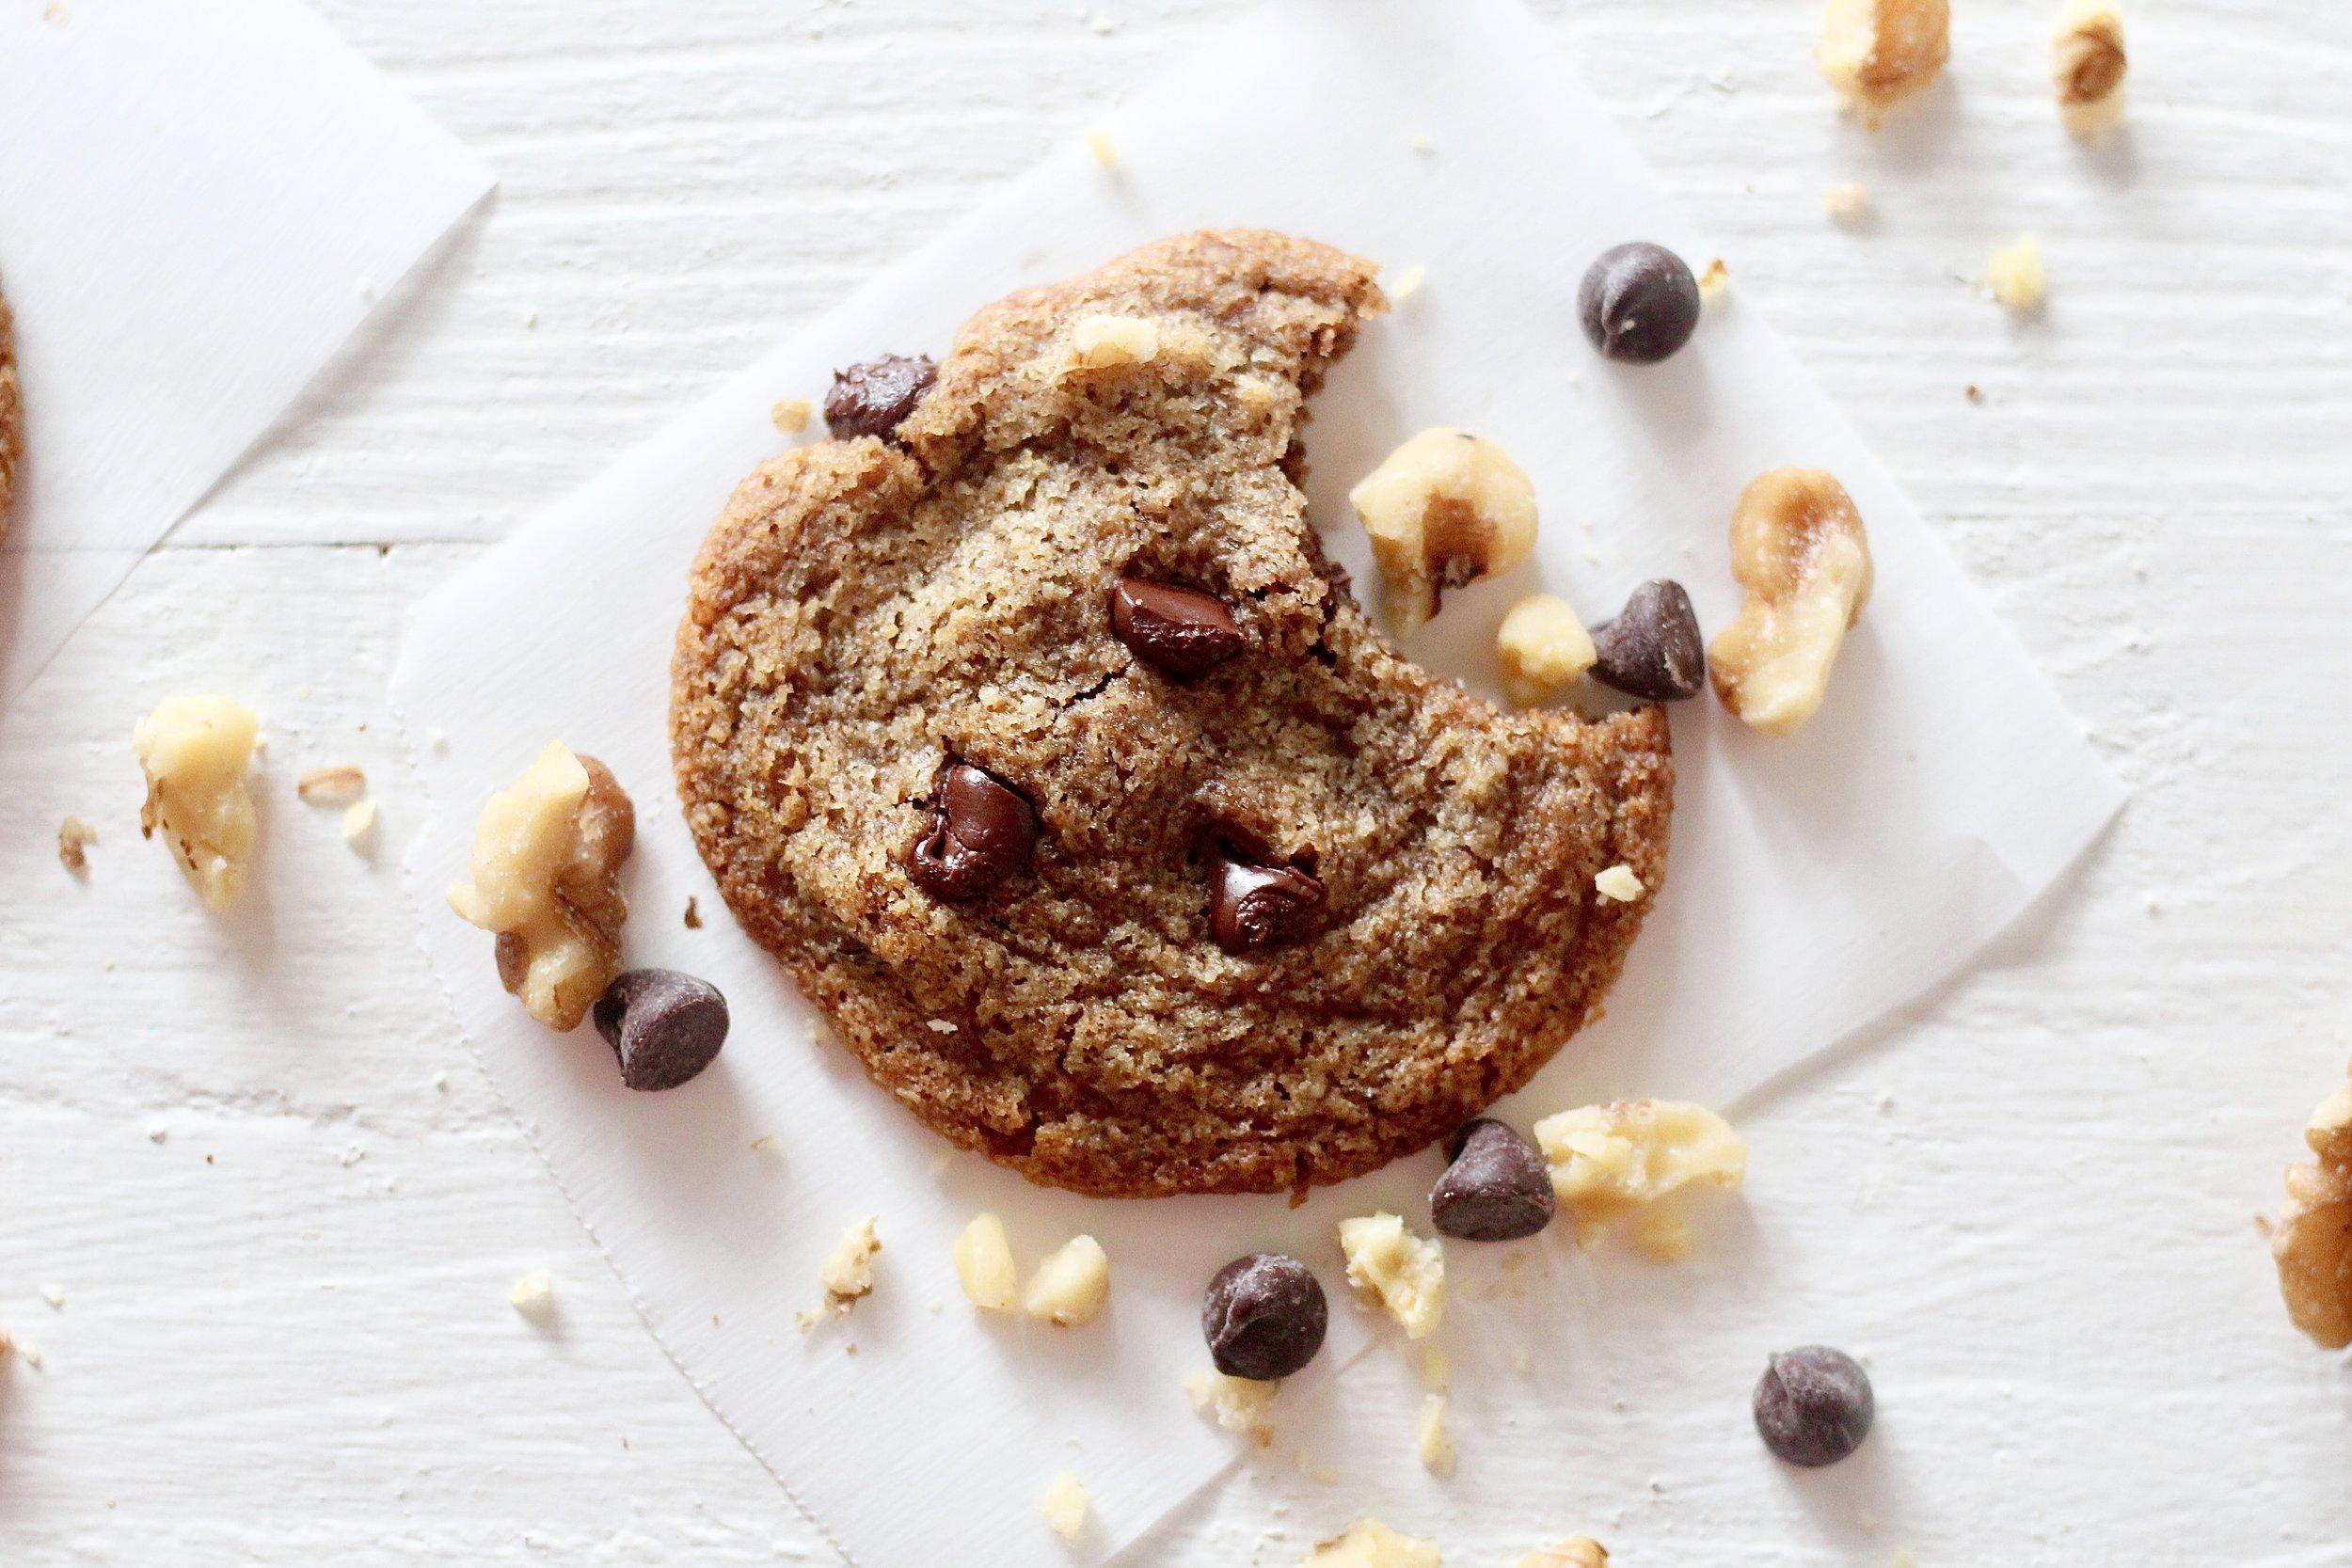 Grain Free Walnut Chocolate Chip Cookies